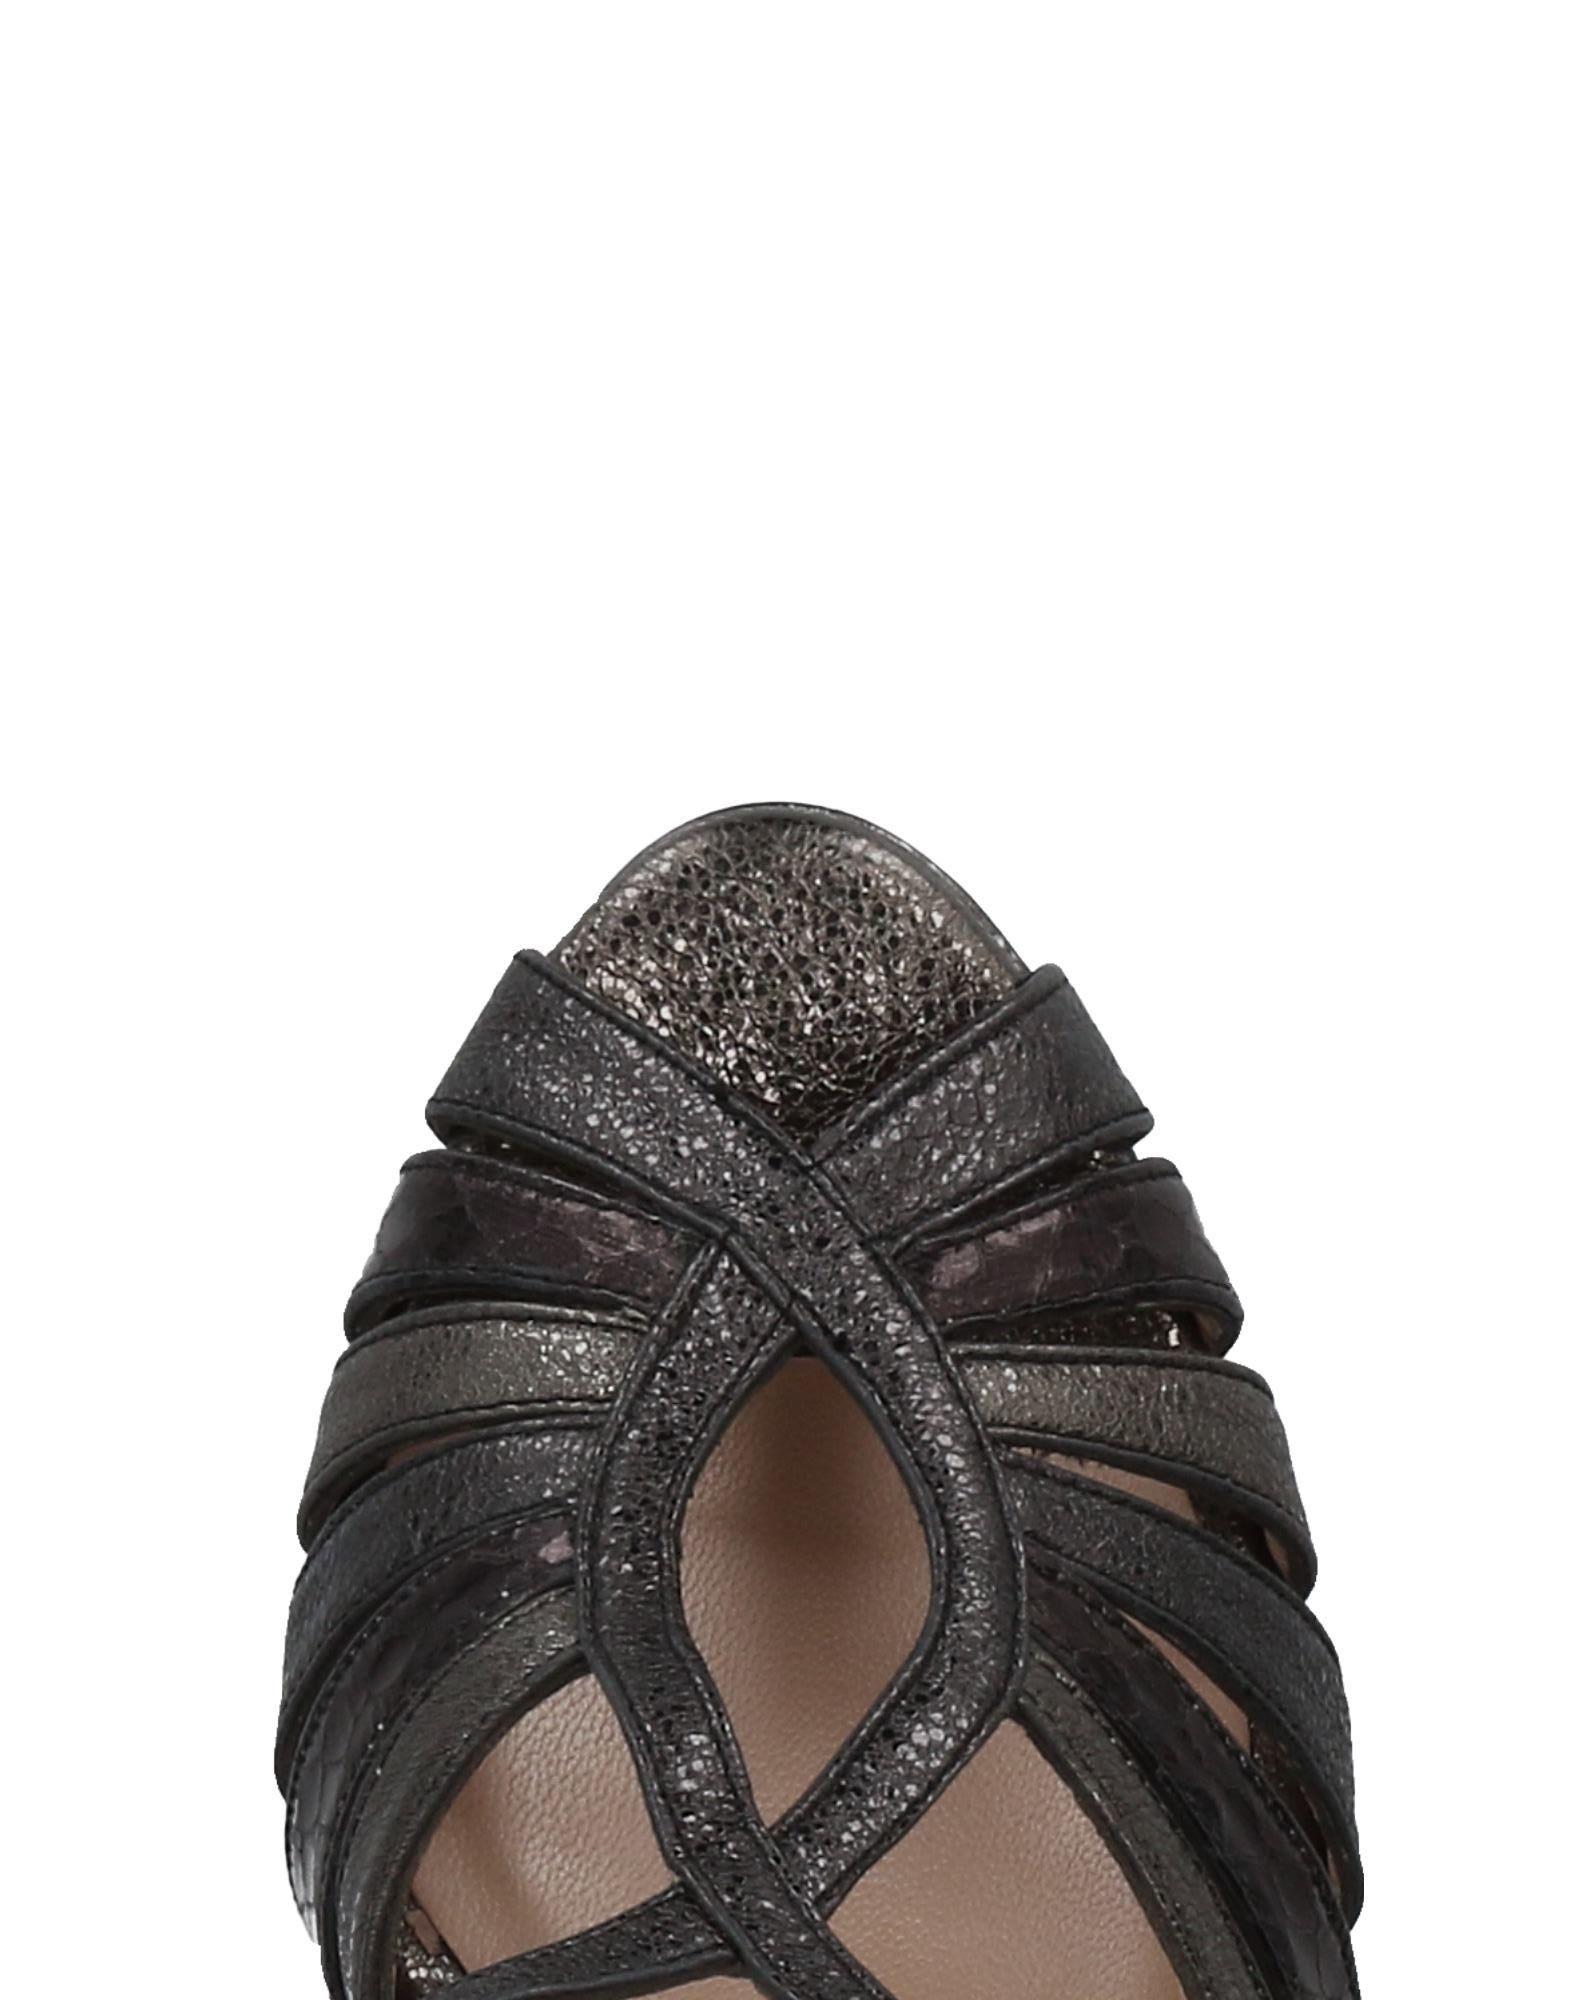 Lodi Sandalen Damen beliebte  11457760XG Gute Qualität beliebte Damen Schuhe eff2ab